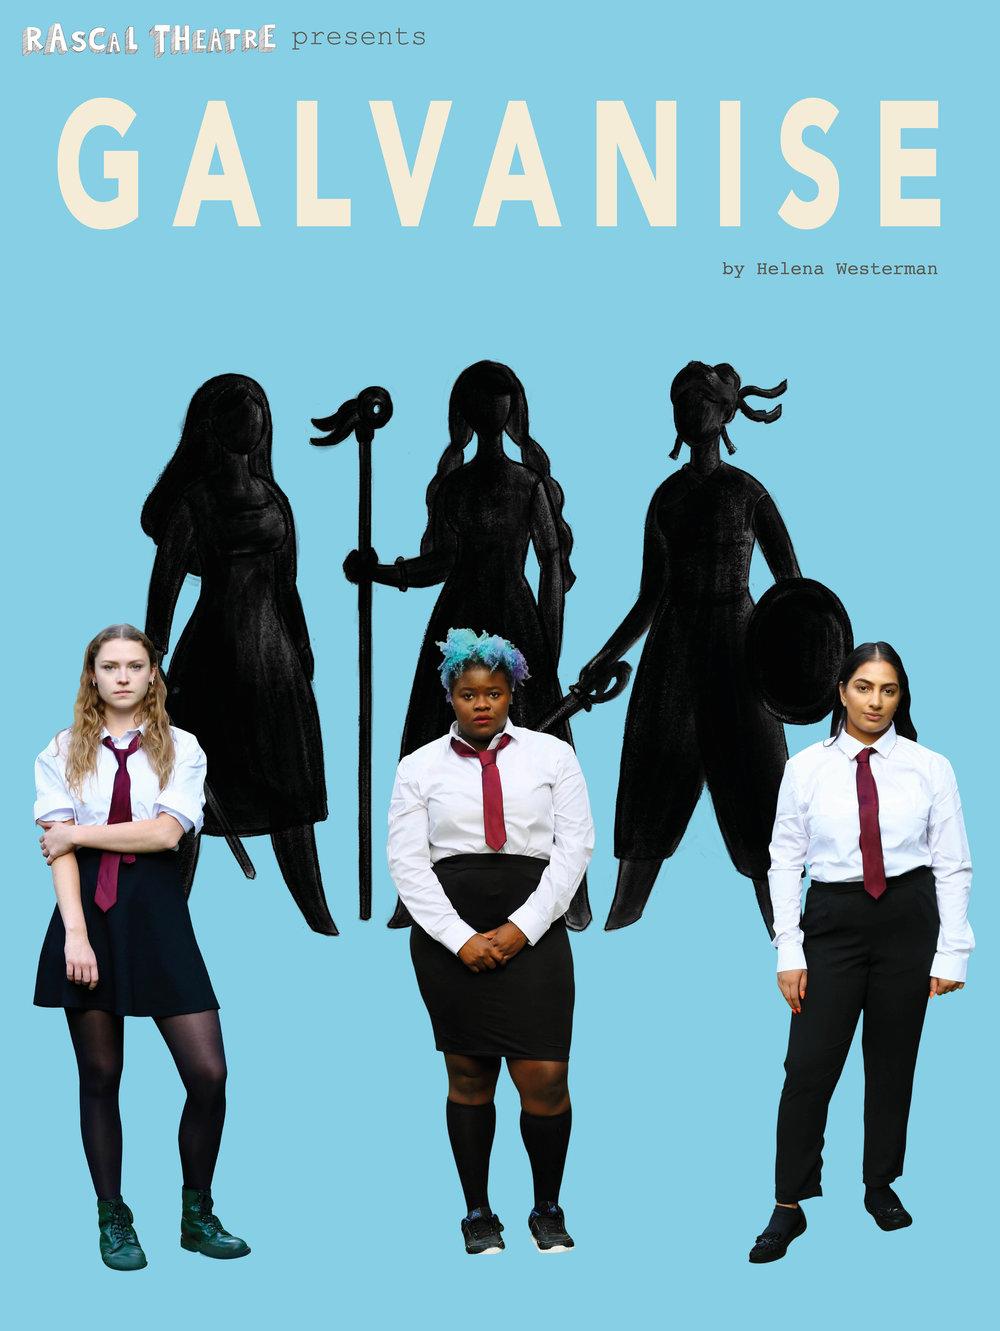 Galvanise A5 Plain image.jpg